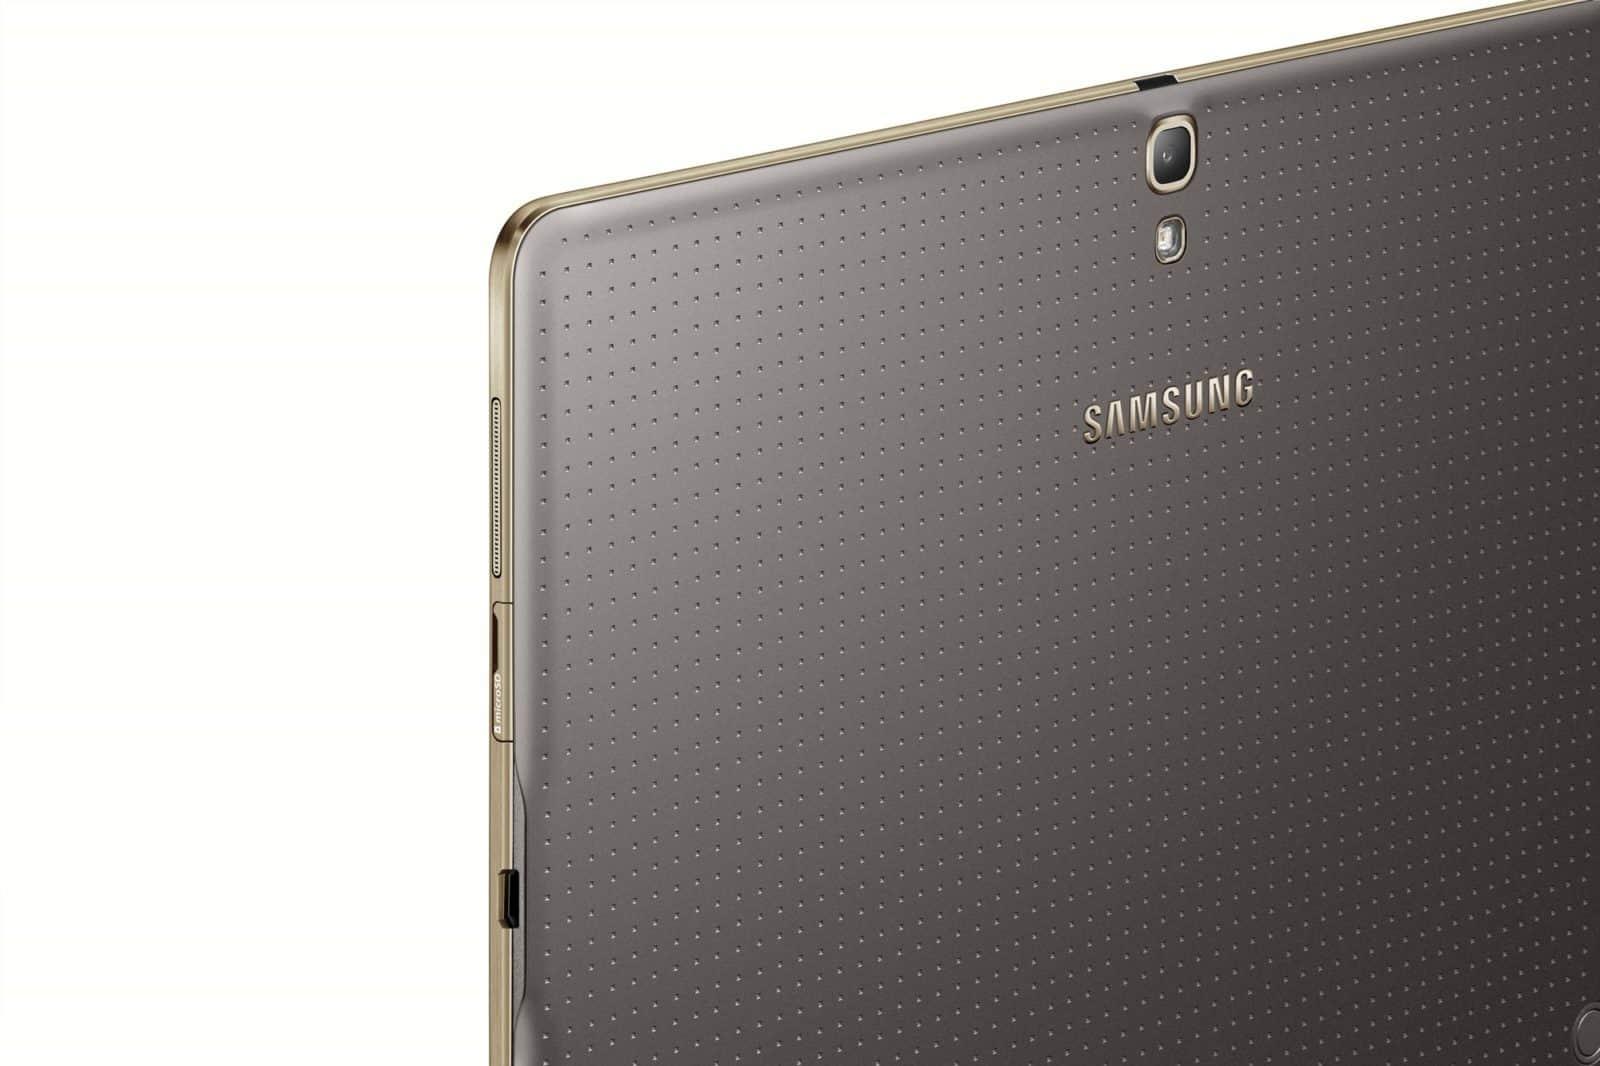 AH Samsung Galaxy Tab S 10.1 3.7 Big